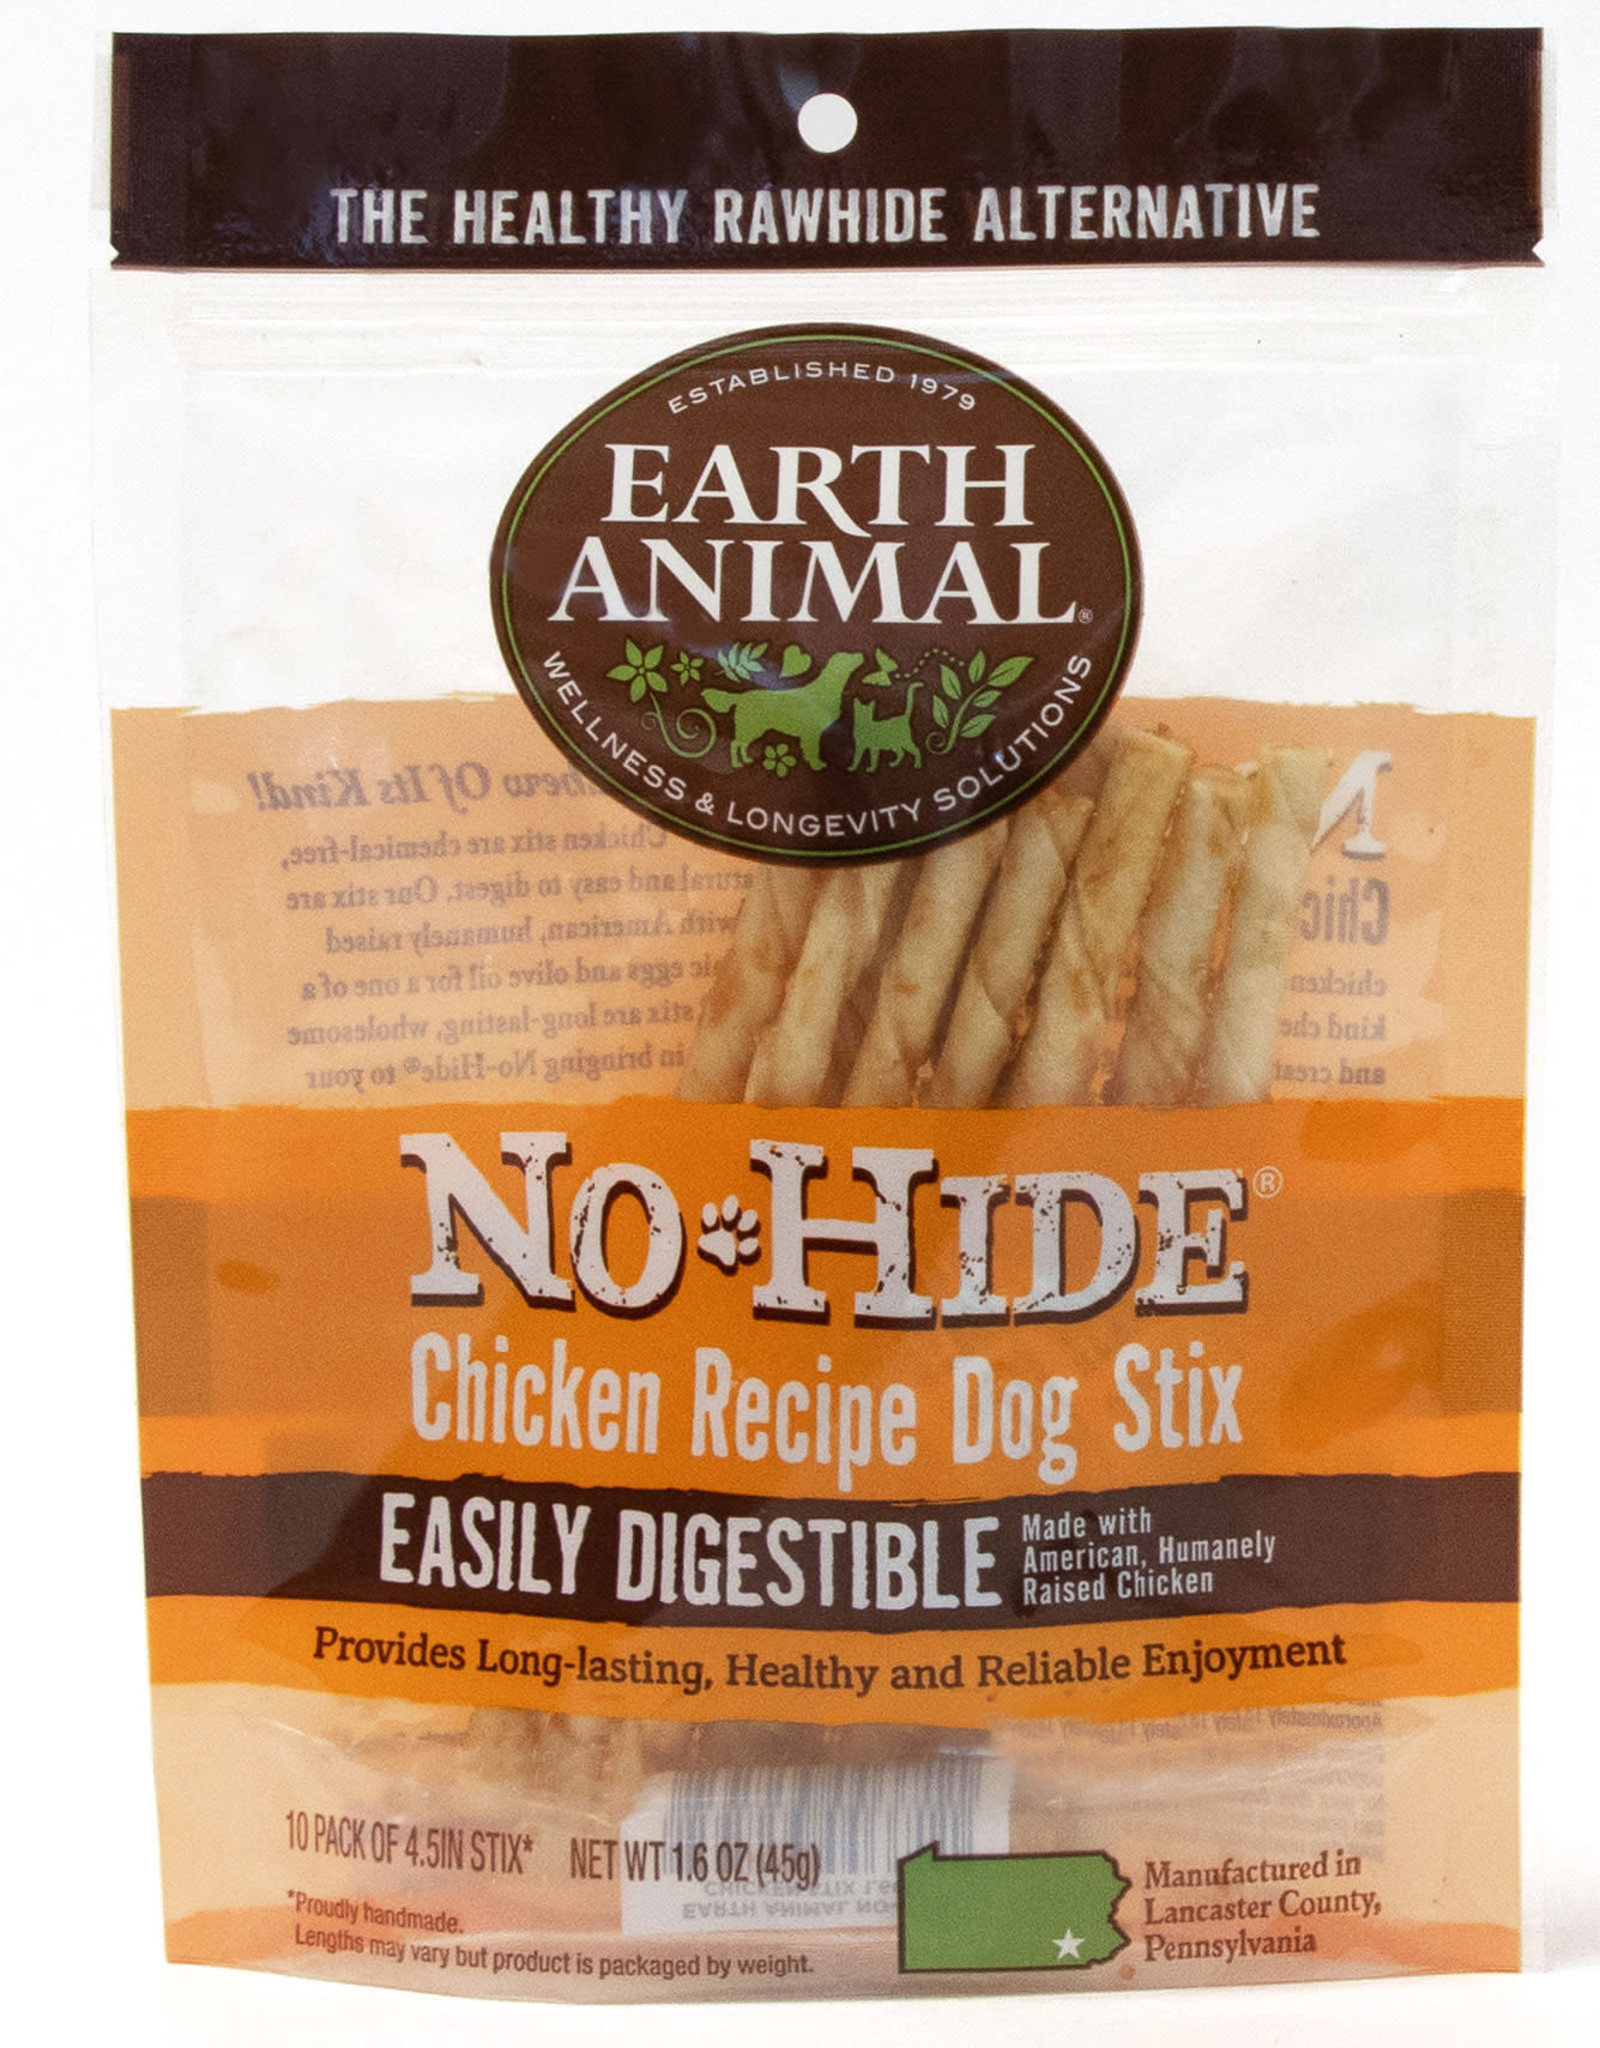 Earth Animal No Hide Chicken Recipe Dog Stix Chew 10 pack 45g